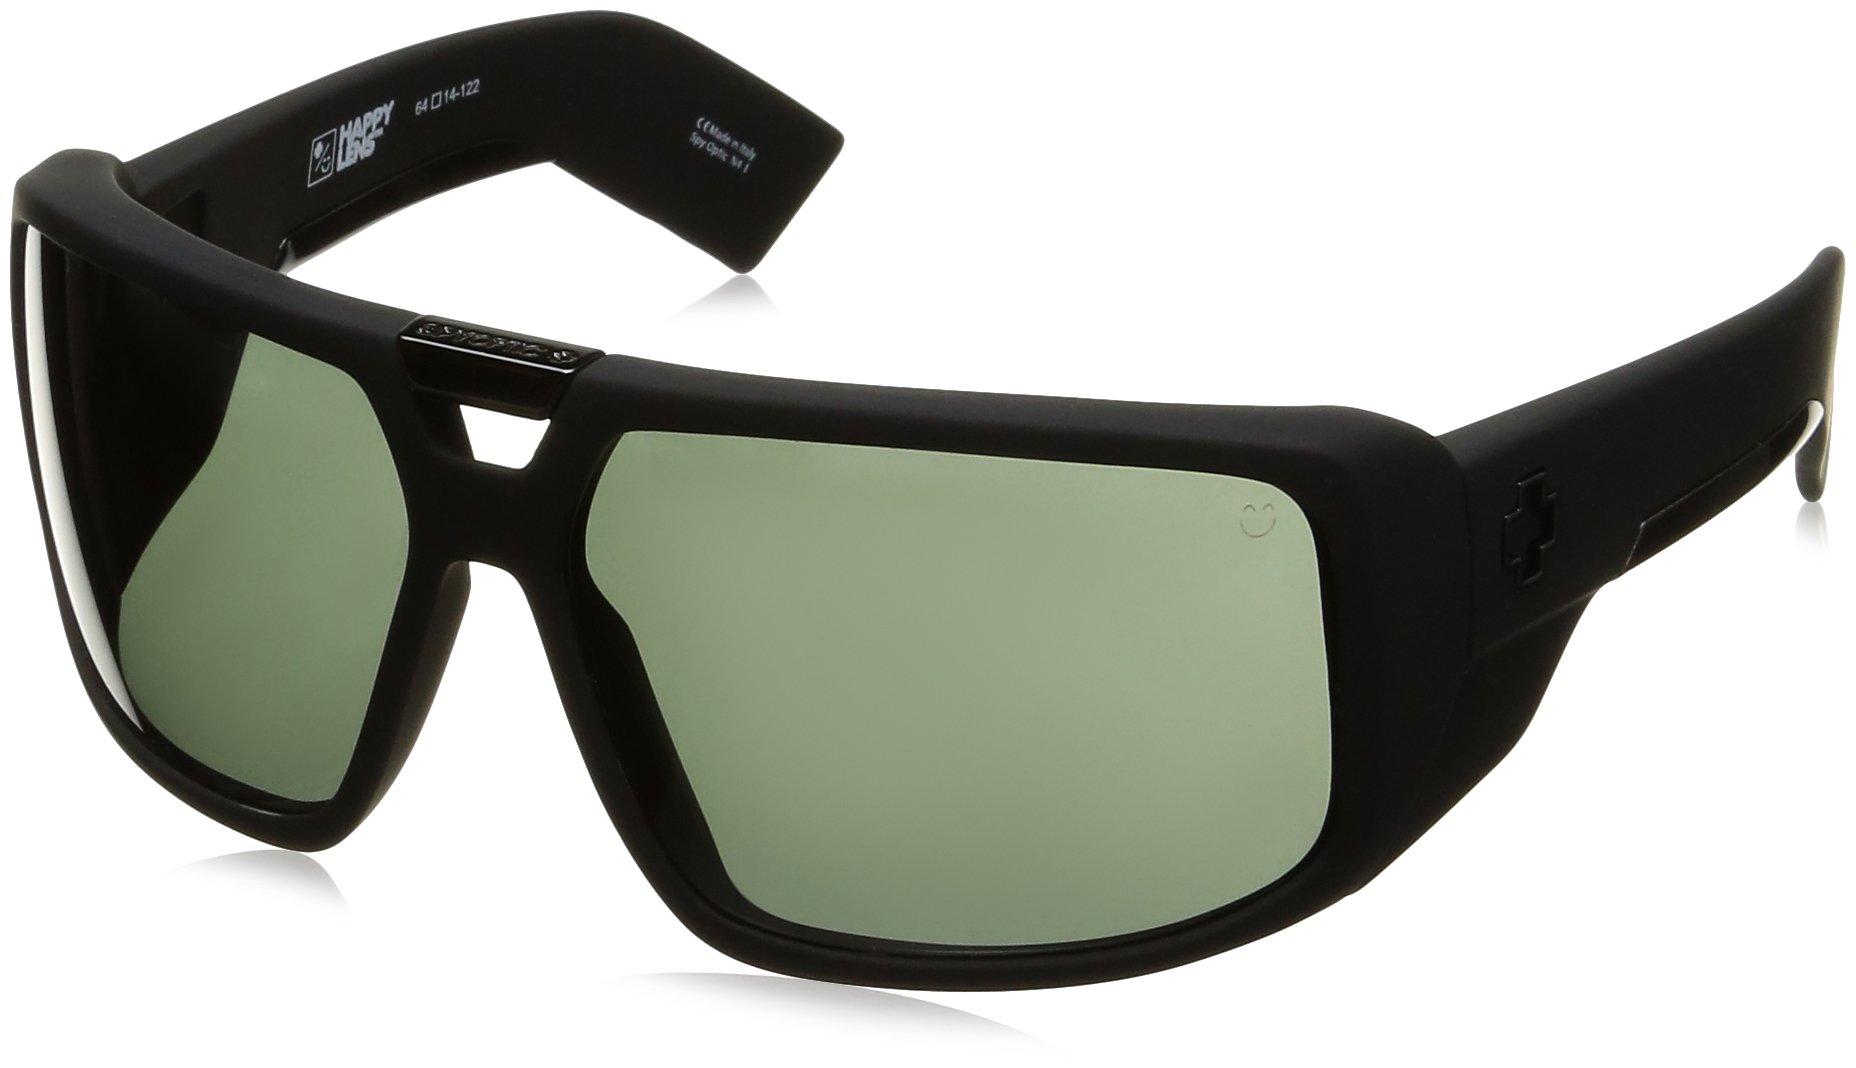 Spy Optic Touring Wrap Sunglasses, Soft Matte Black/Happy Gray/Green, 64 mm